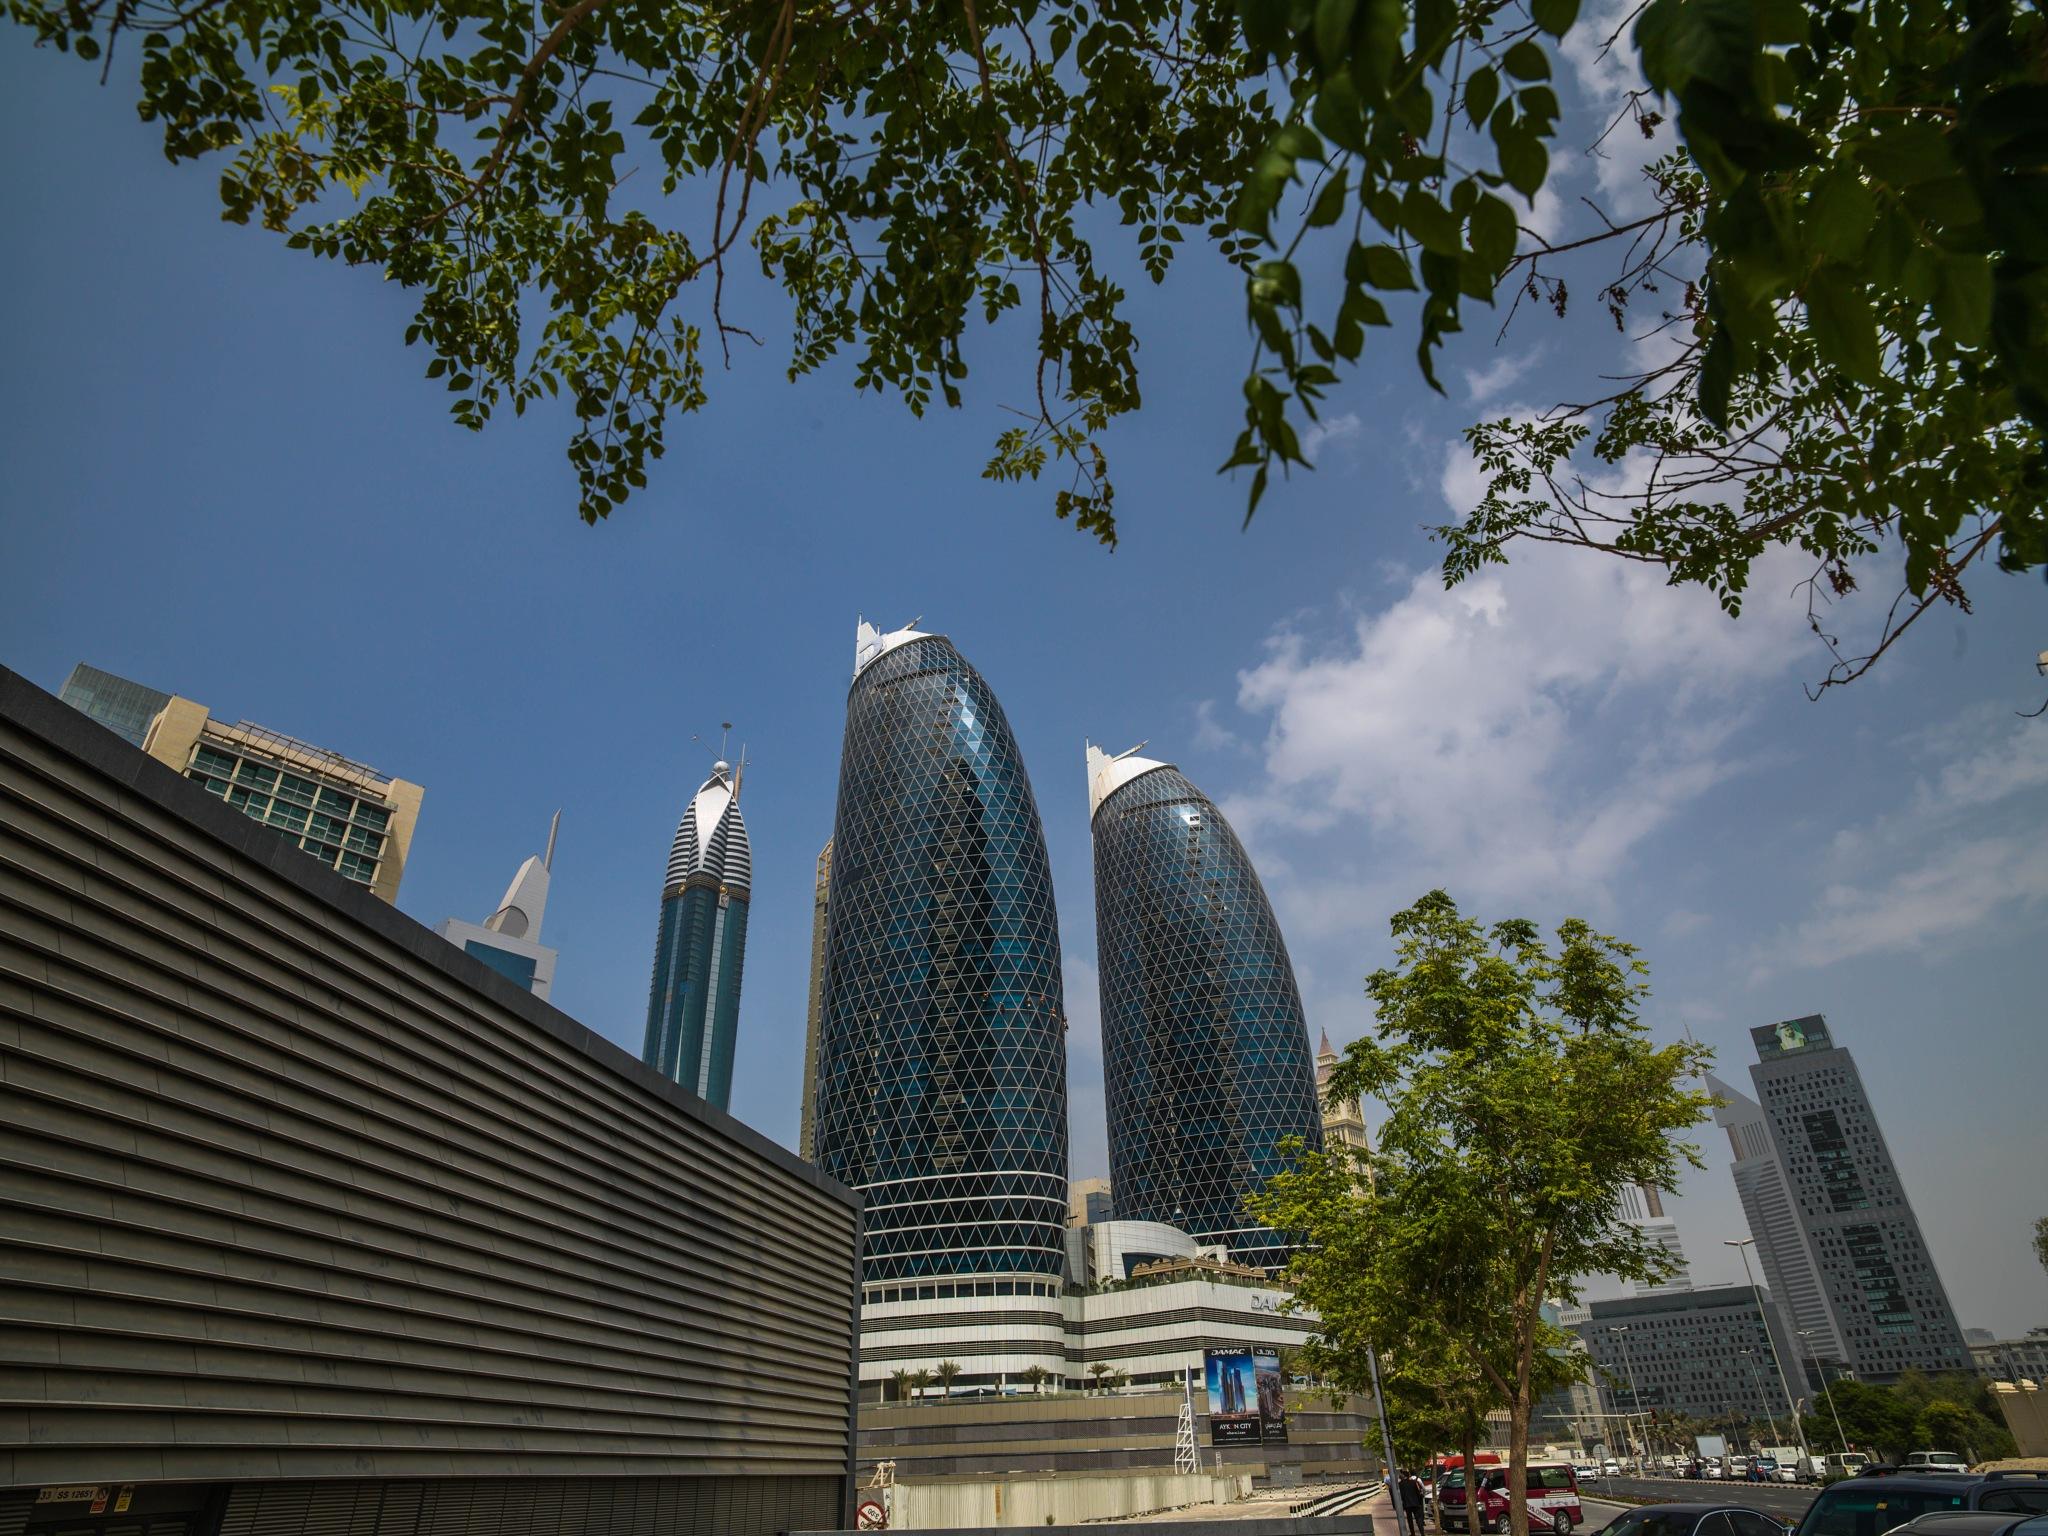 DAMAC Towers by muhammad.nasser.963